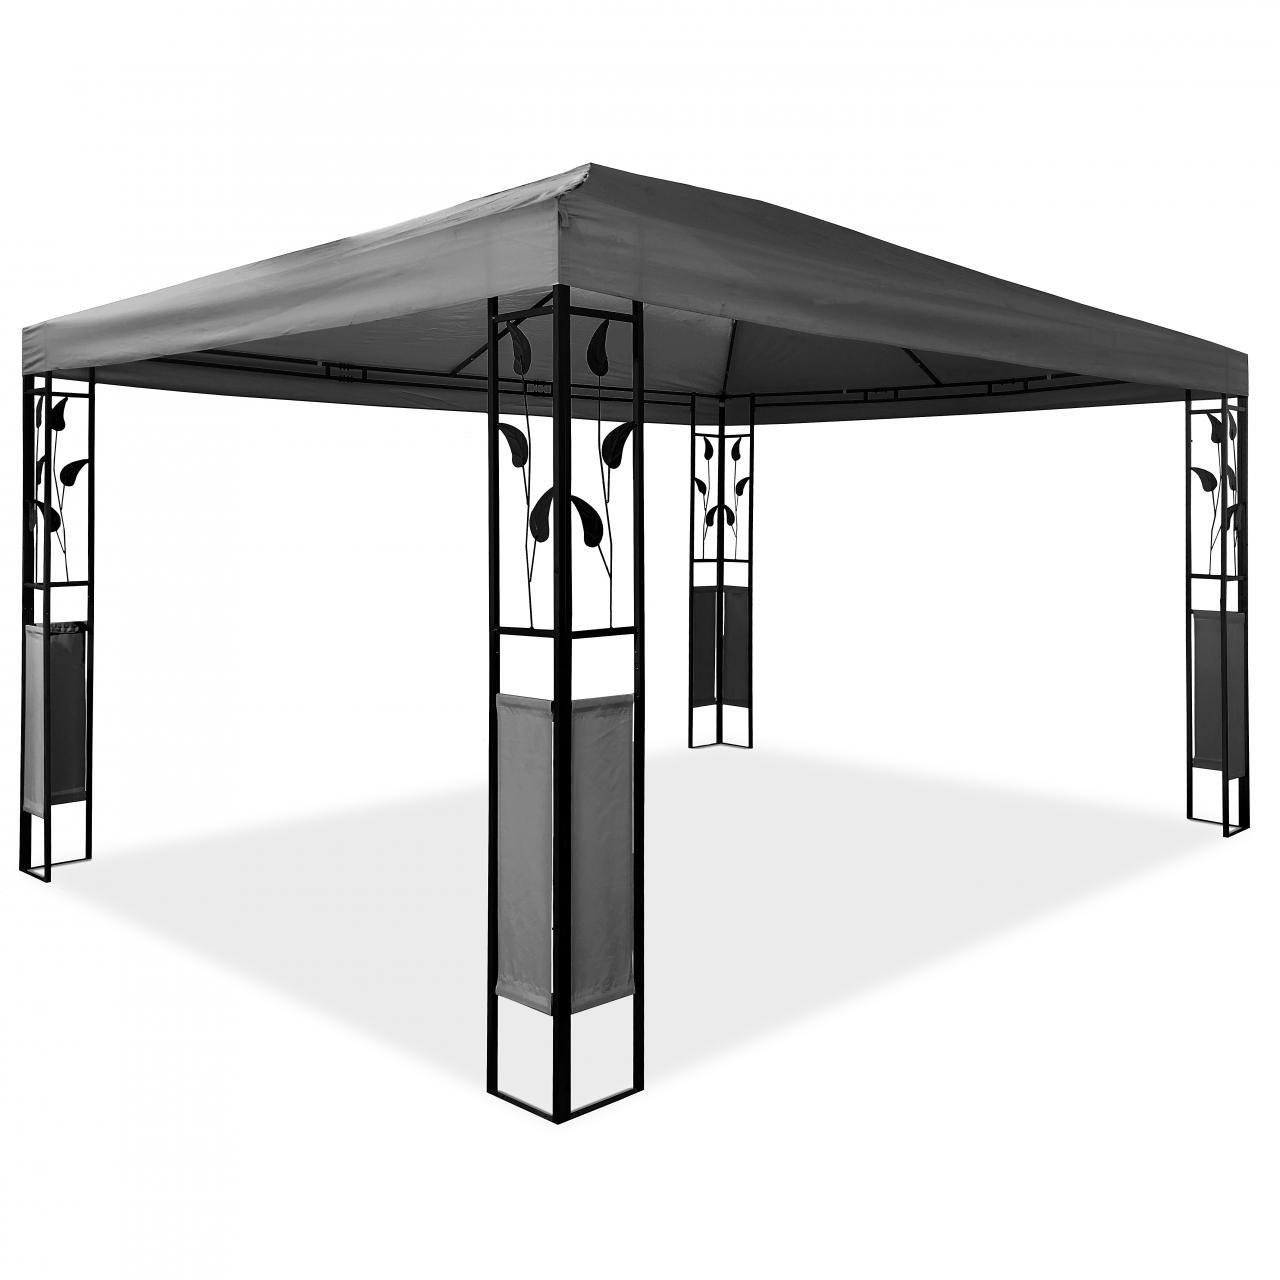 Metall Pavillon mit Ornamenten 3 x 4 m Blätter-Pavillon ...